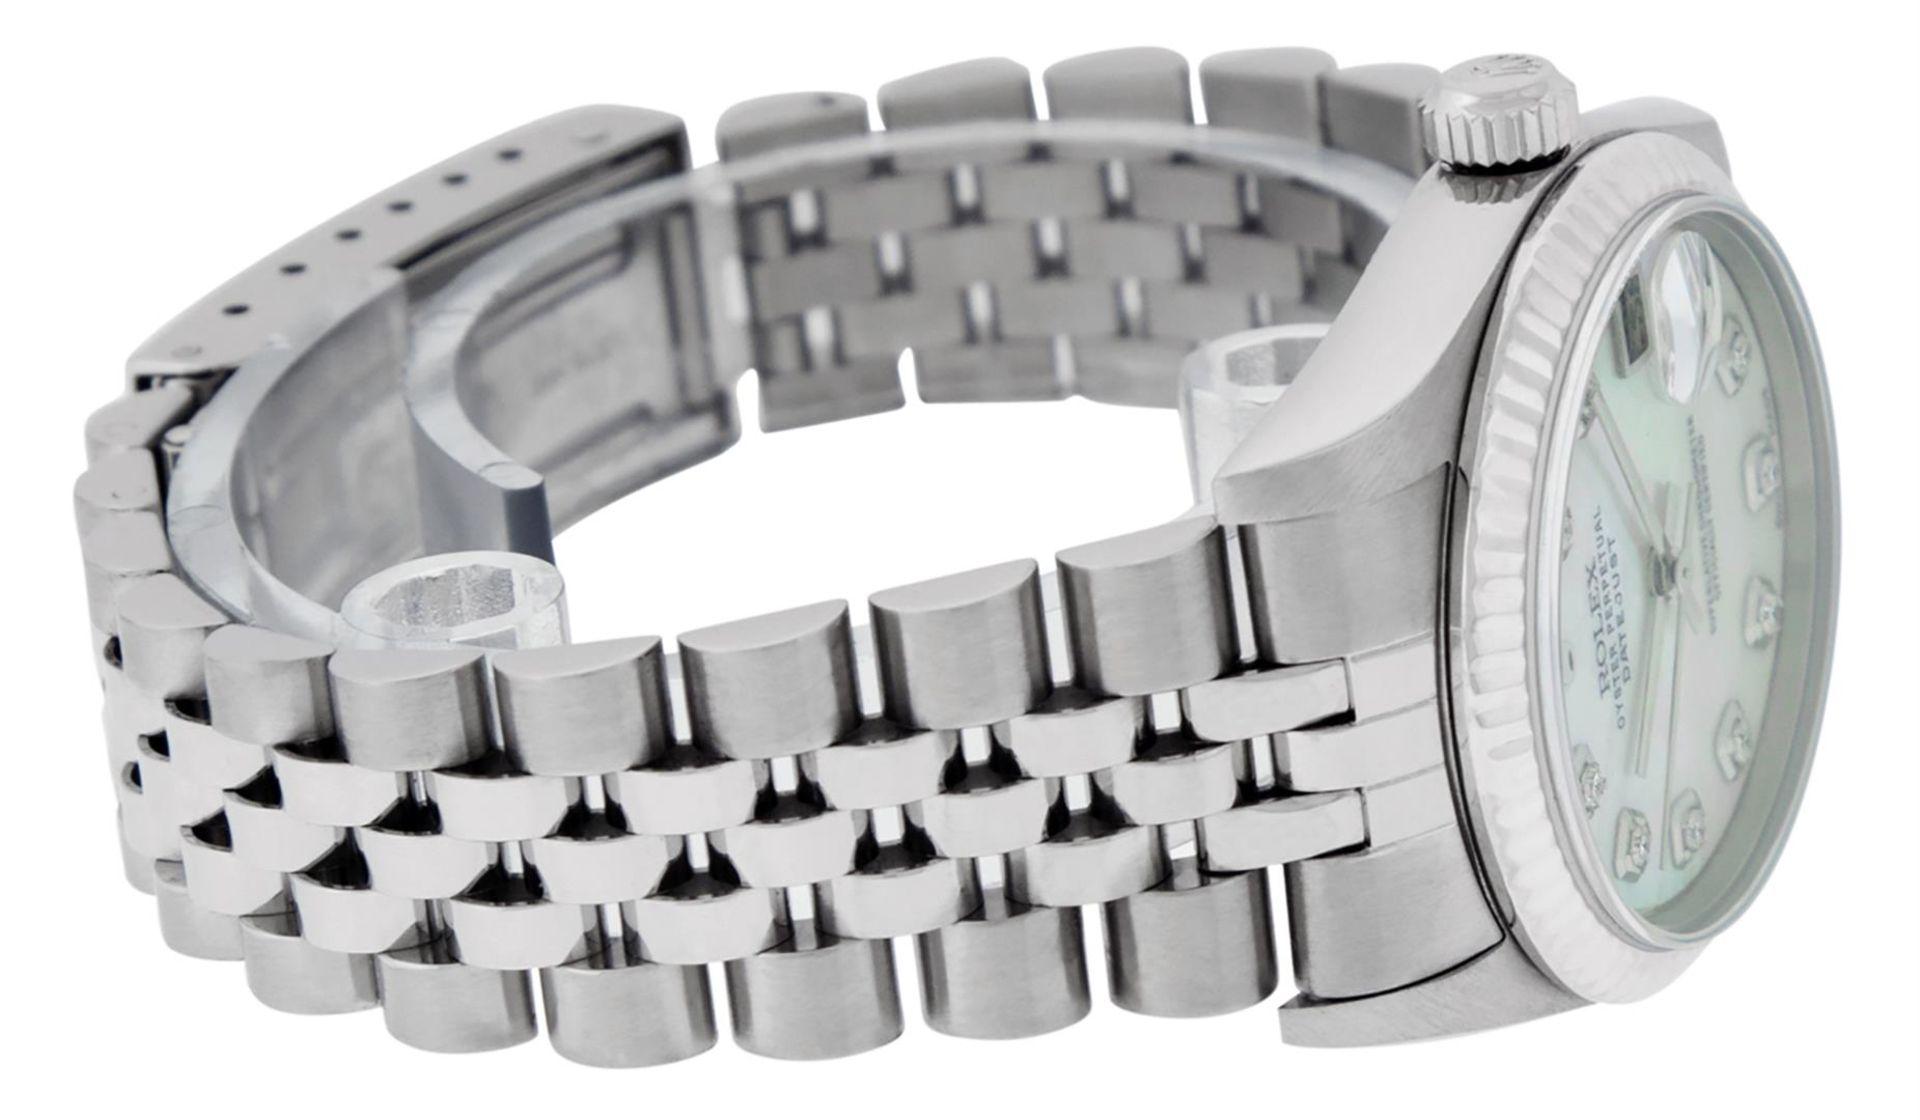 Rolex Womens Midsize Quickset 31mm MOP Diamond Stainless Steel Datejust Wriswatc - Image 5 of 9